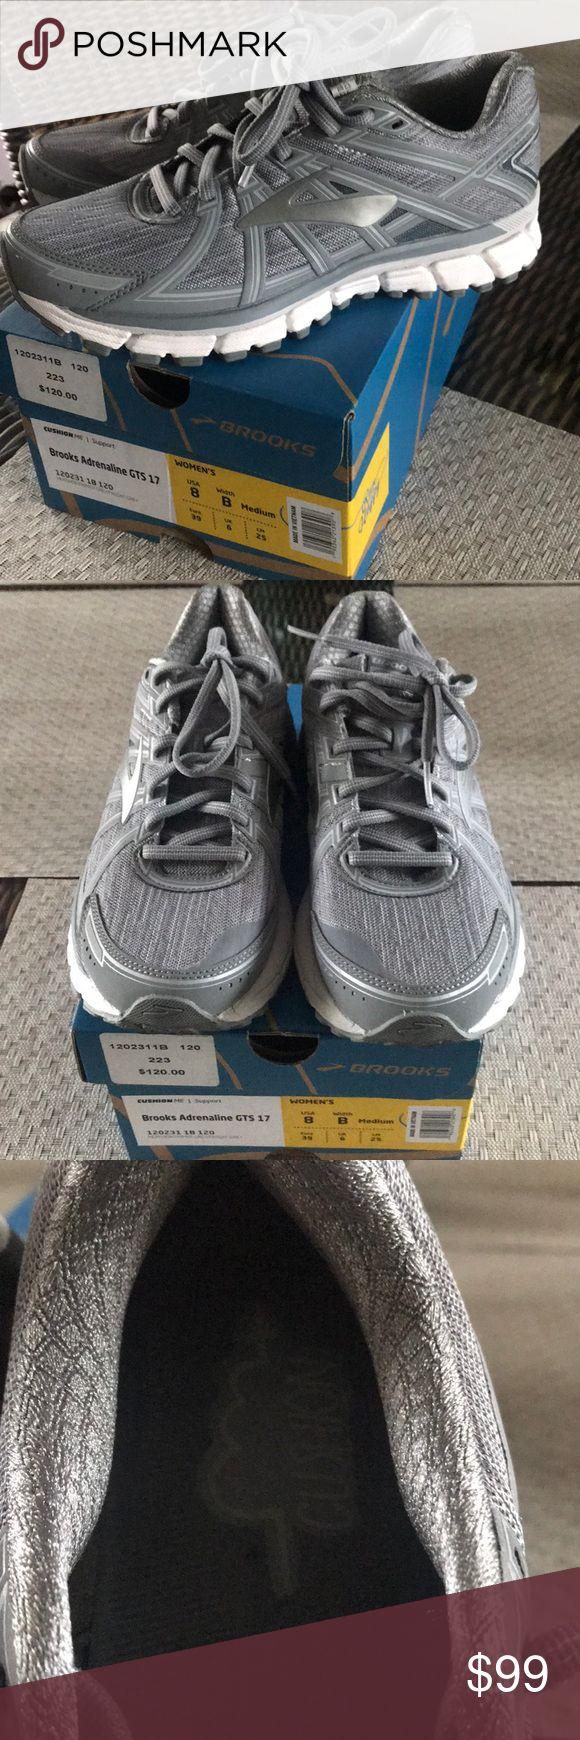 torsion adidas shoes 1995 toyota celica 637807